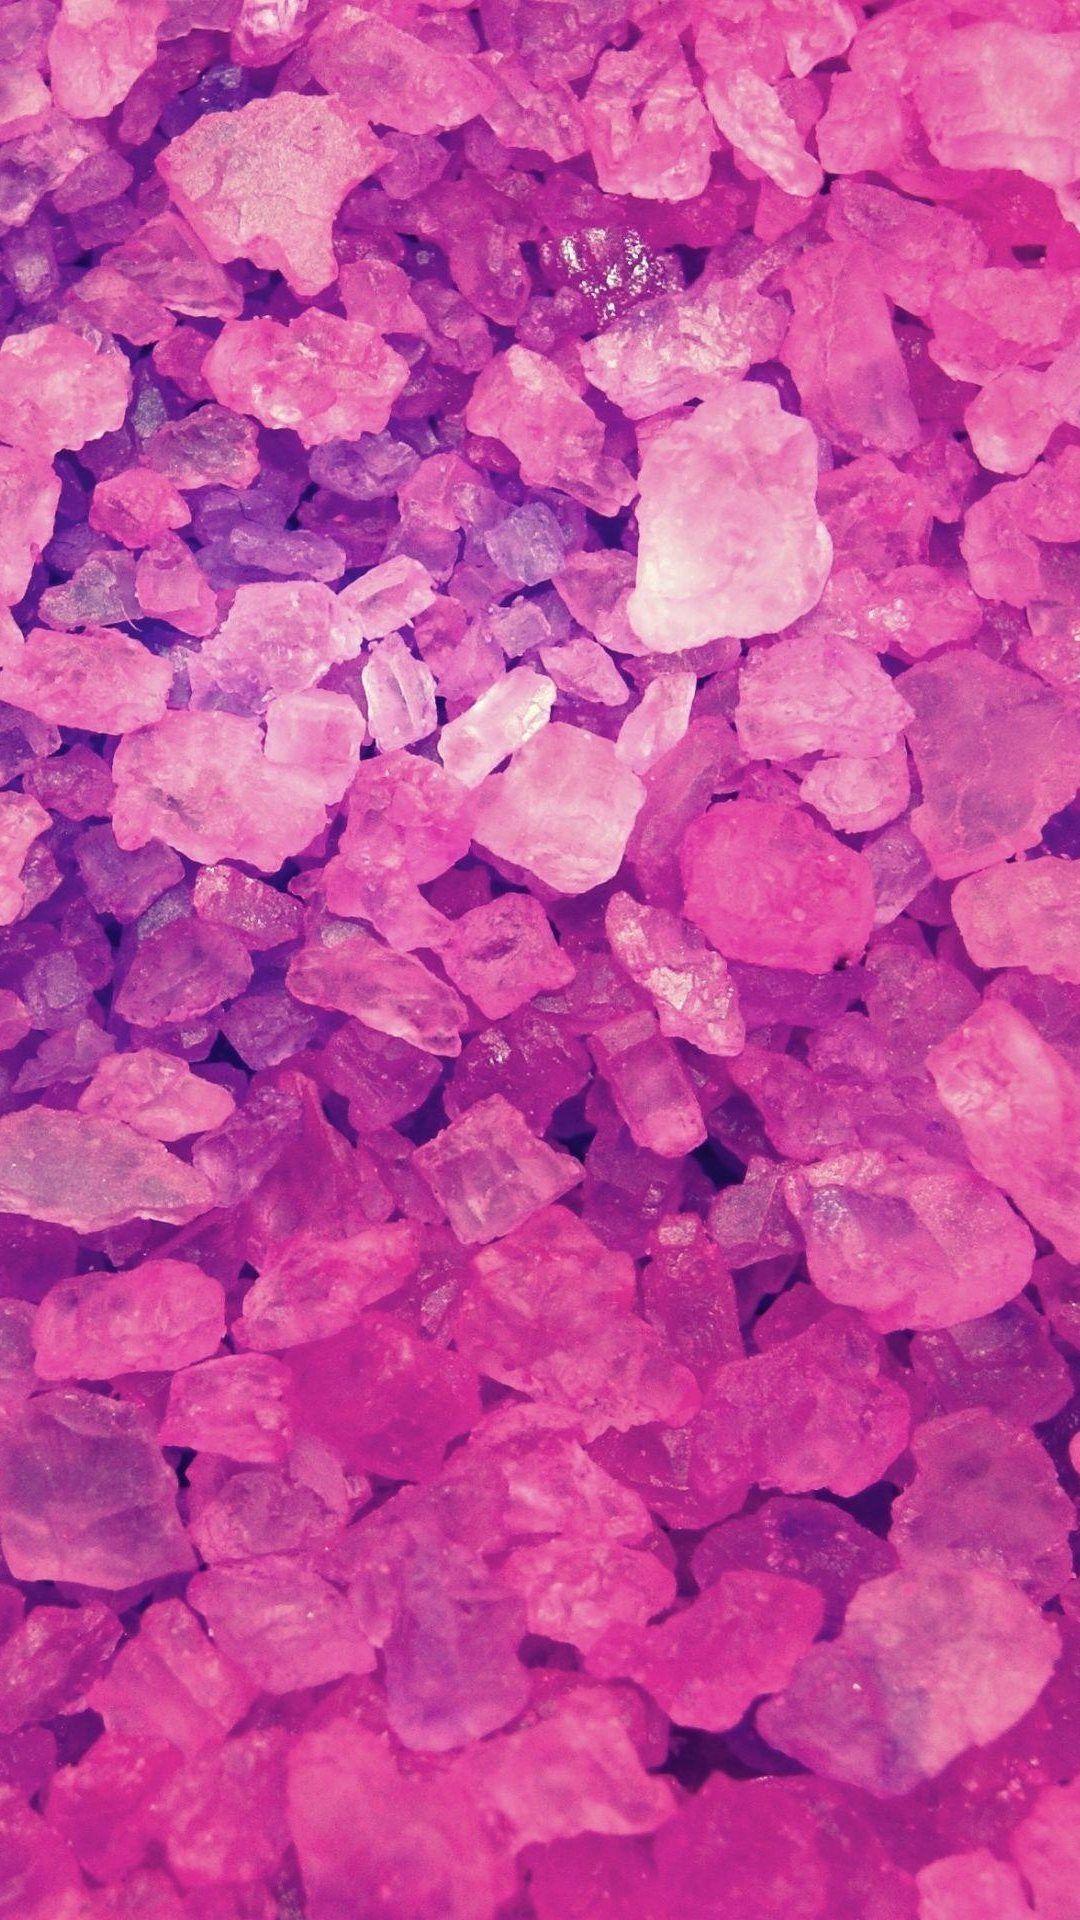 Pink Crystals Lockscreen Iphone 6 Plus Hd Wallpaper Black Pink Kpop Pink Wallpaper Iphone 6 Wallpaper